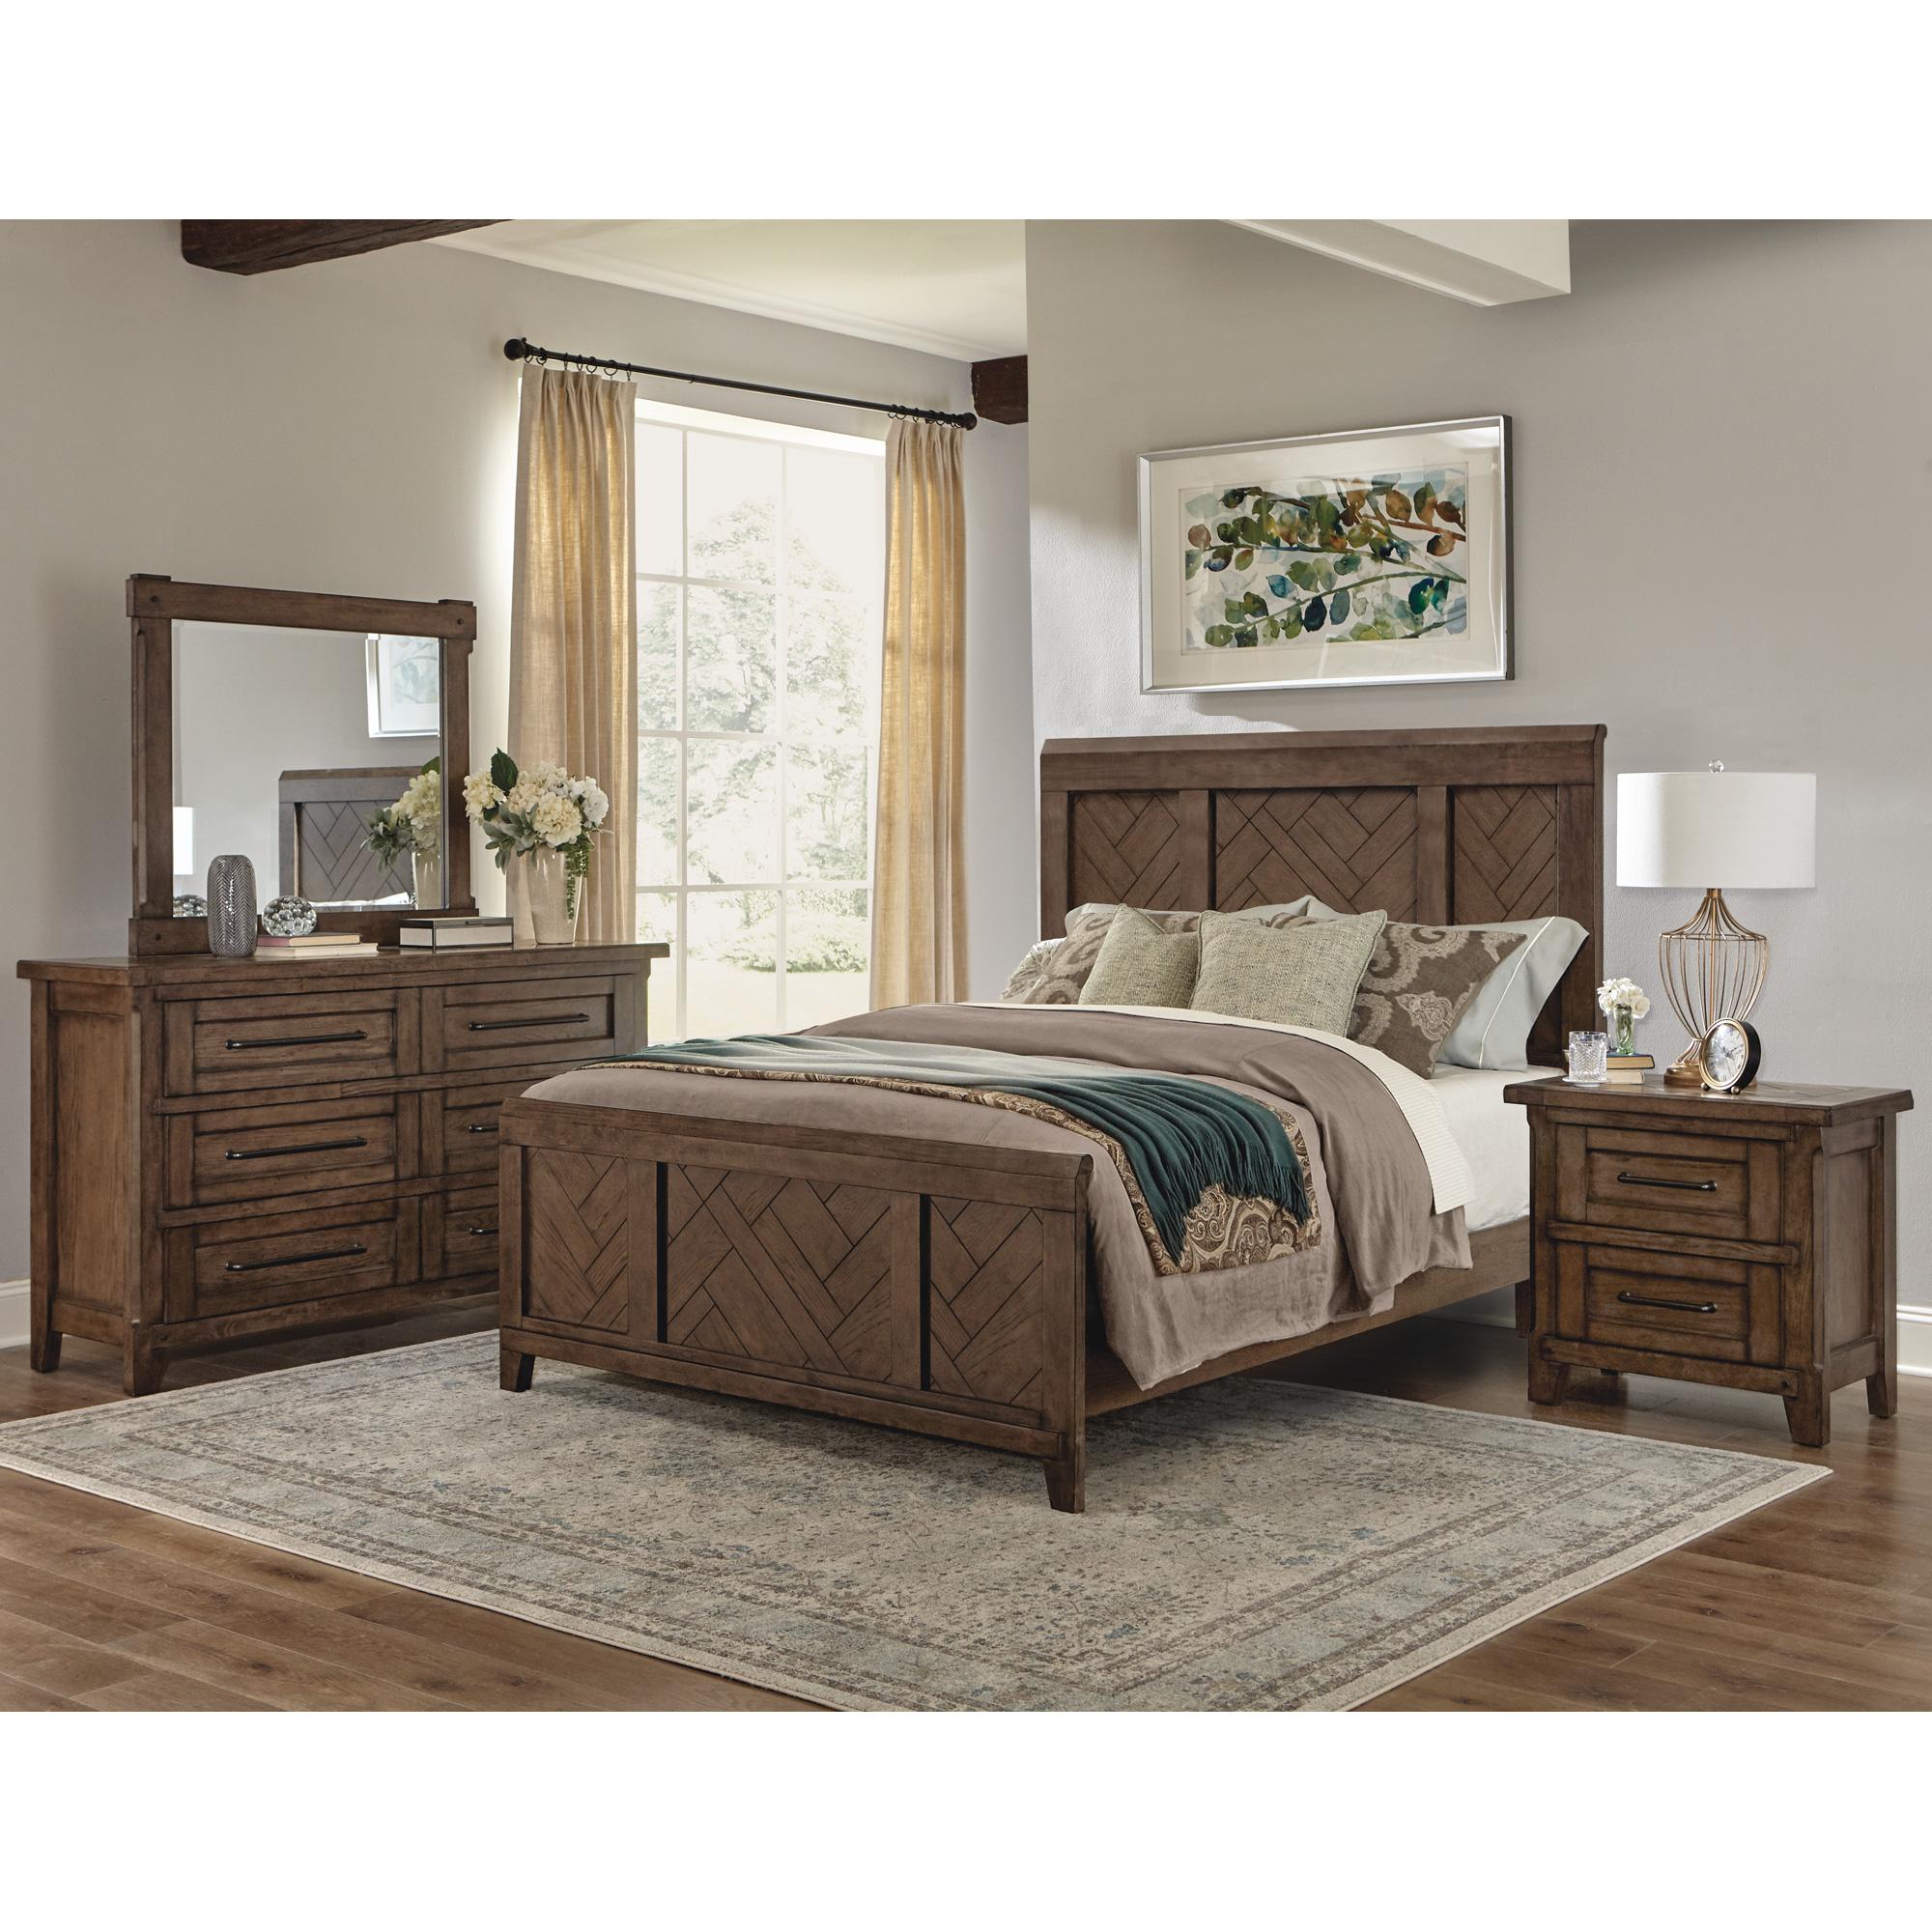 Davis Direct | Patches Gray Brown Queen Panel 4 Piece Room Group Bedroom Set